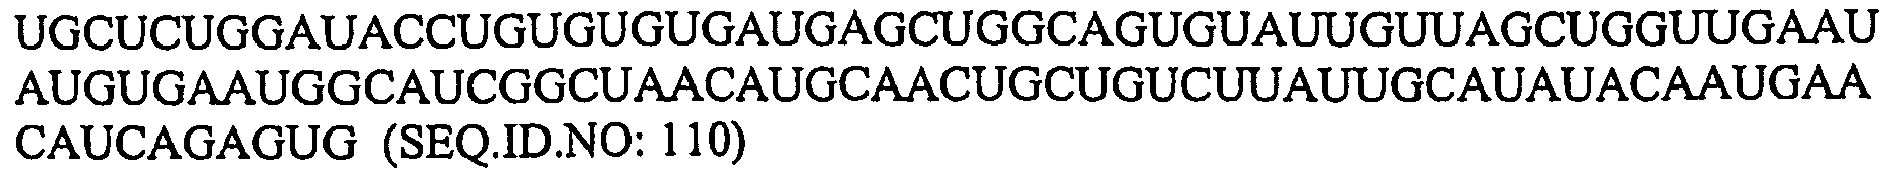 Figure imgb0016